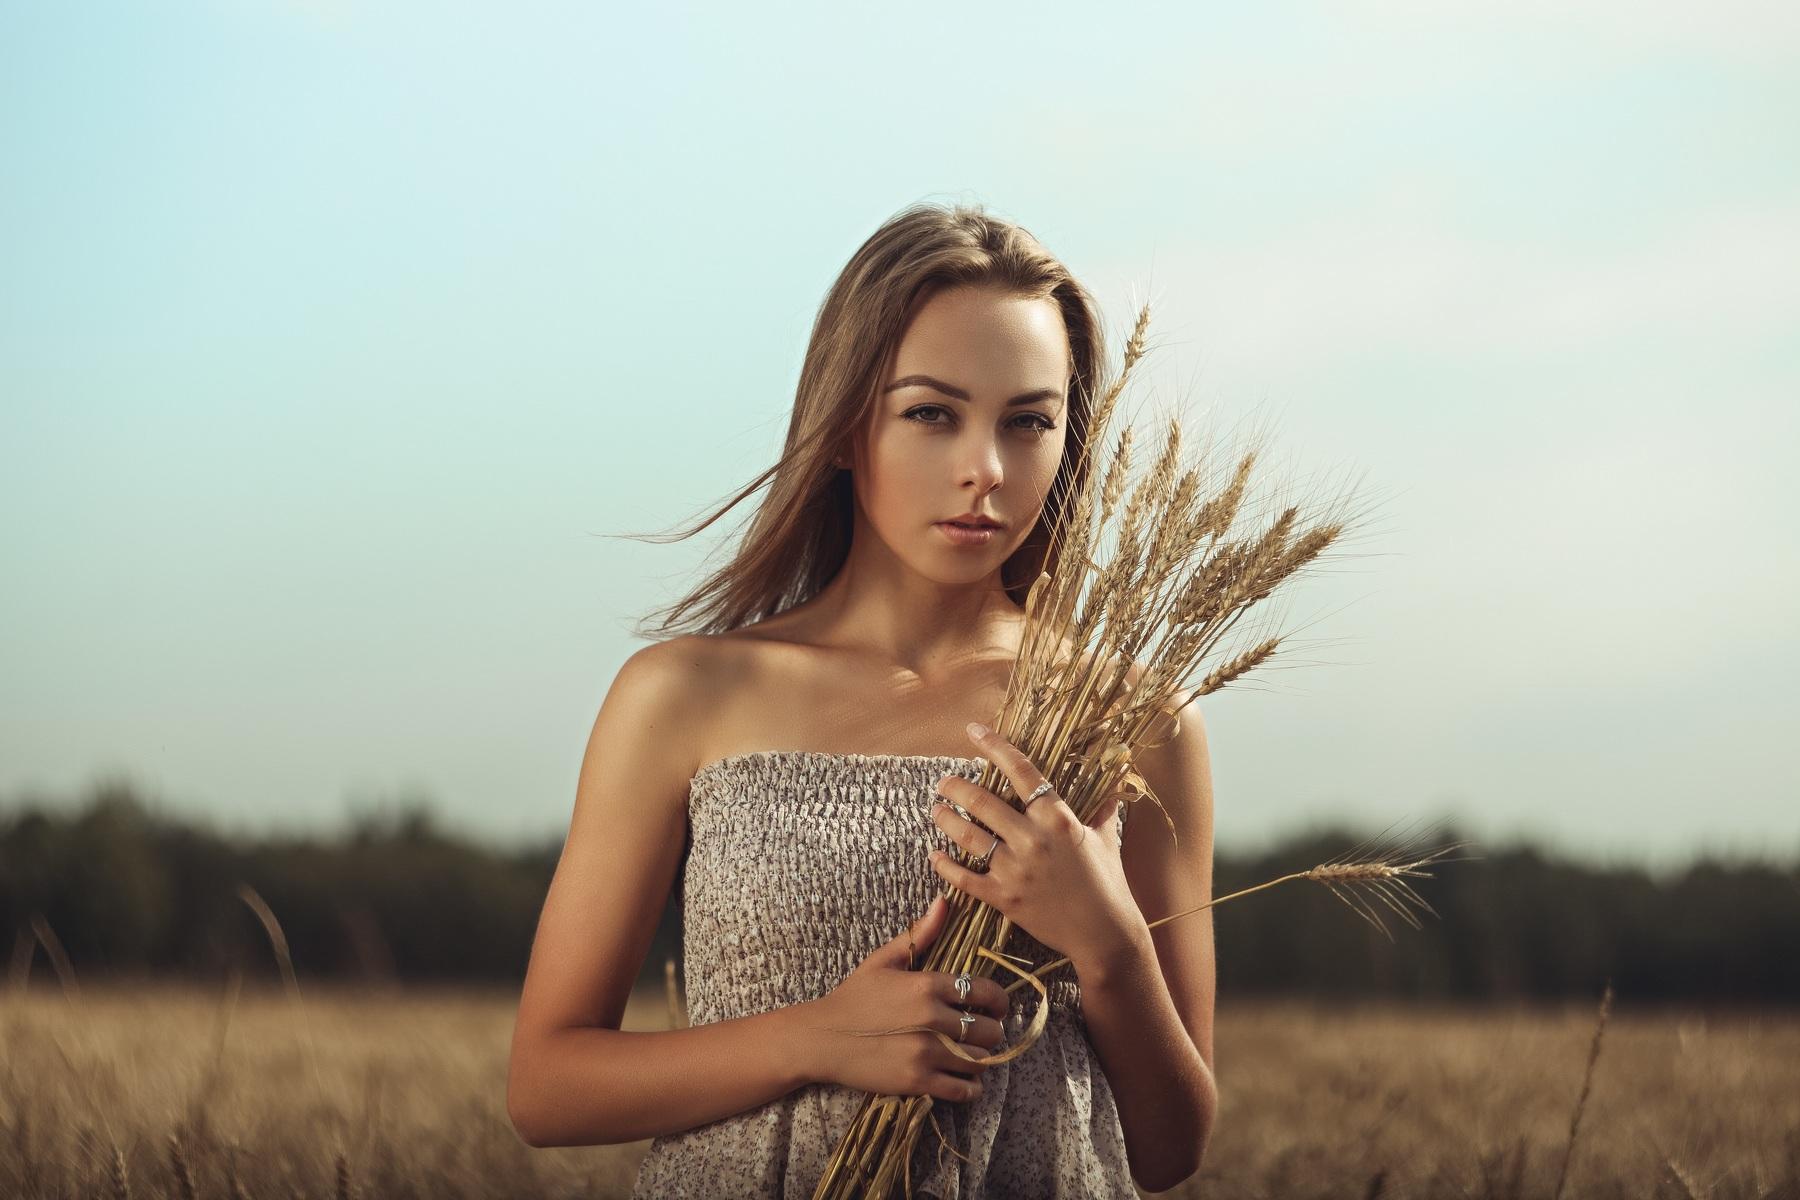 field, Nature, Women Outdoors, Women, Model Wallpapers HD